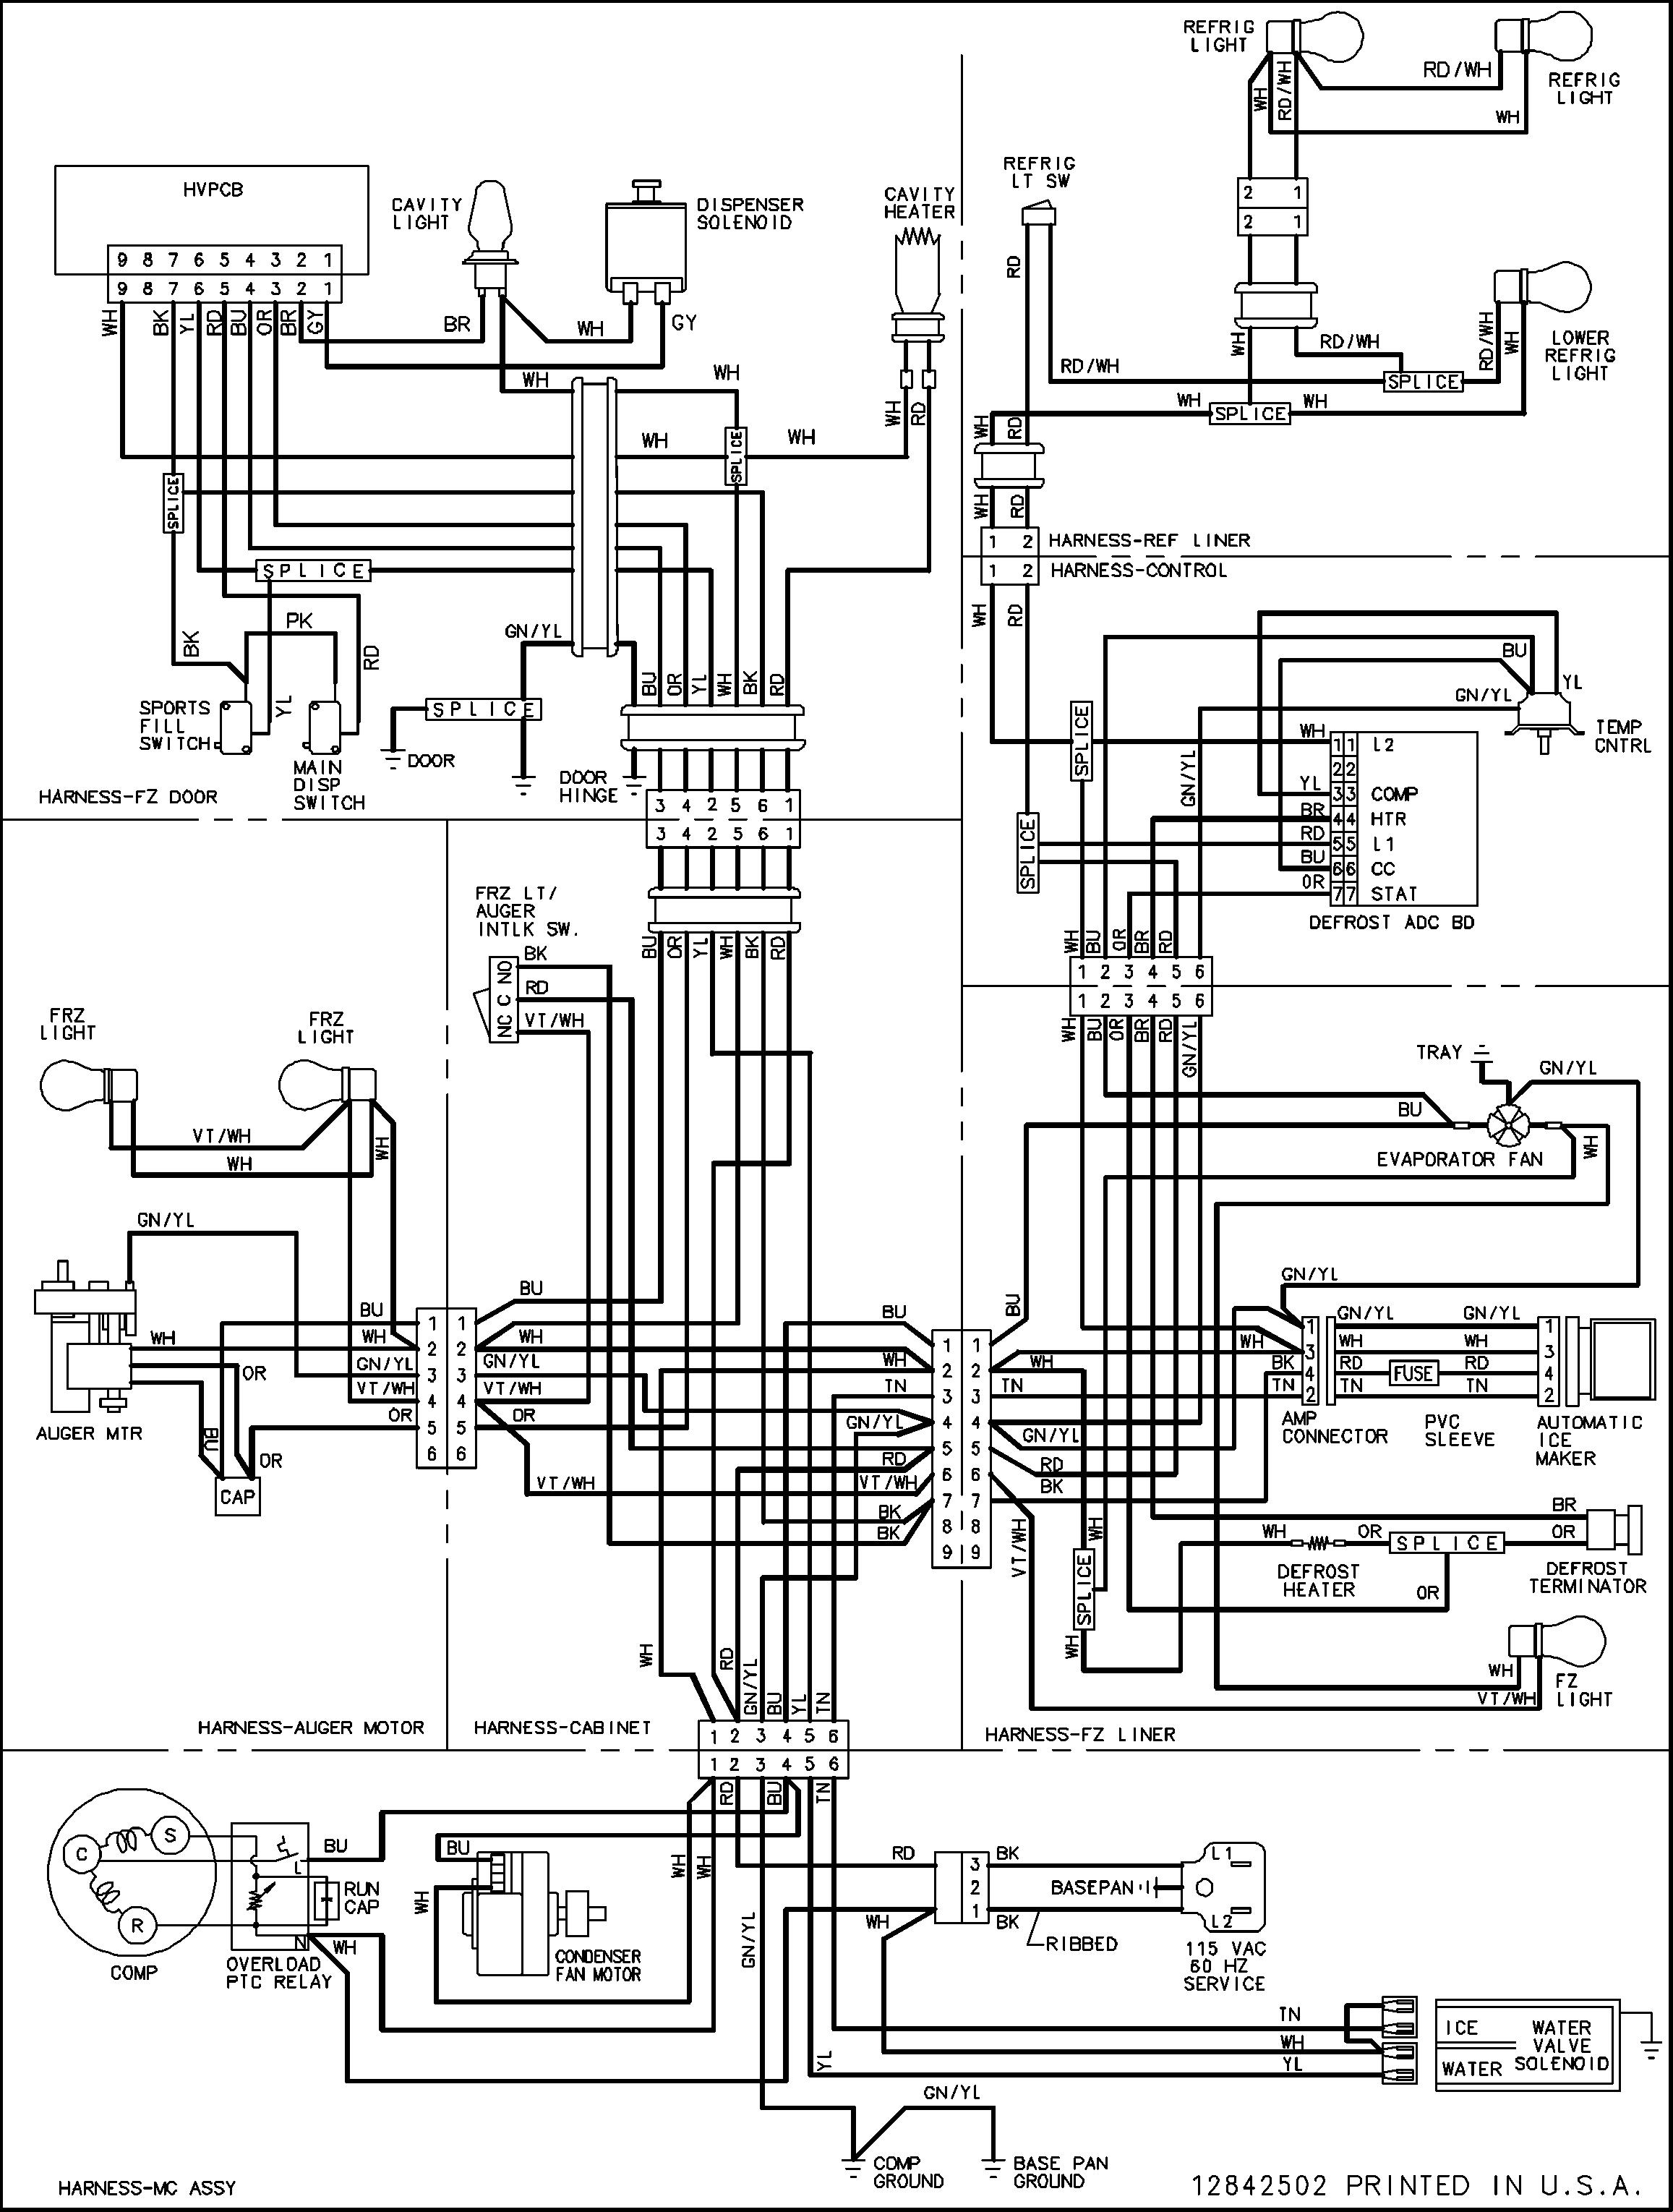 SM_8626] Rv Thermostat Wiring Diagram Also Amana Refrigerator Wiring  Diagram Wiring DiagramTivexi Rosz Nnigh Phot Phae Mohammedshrine Librar Wiring 101